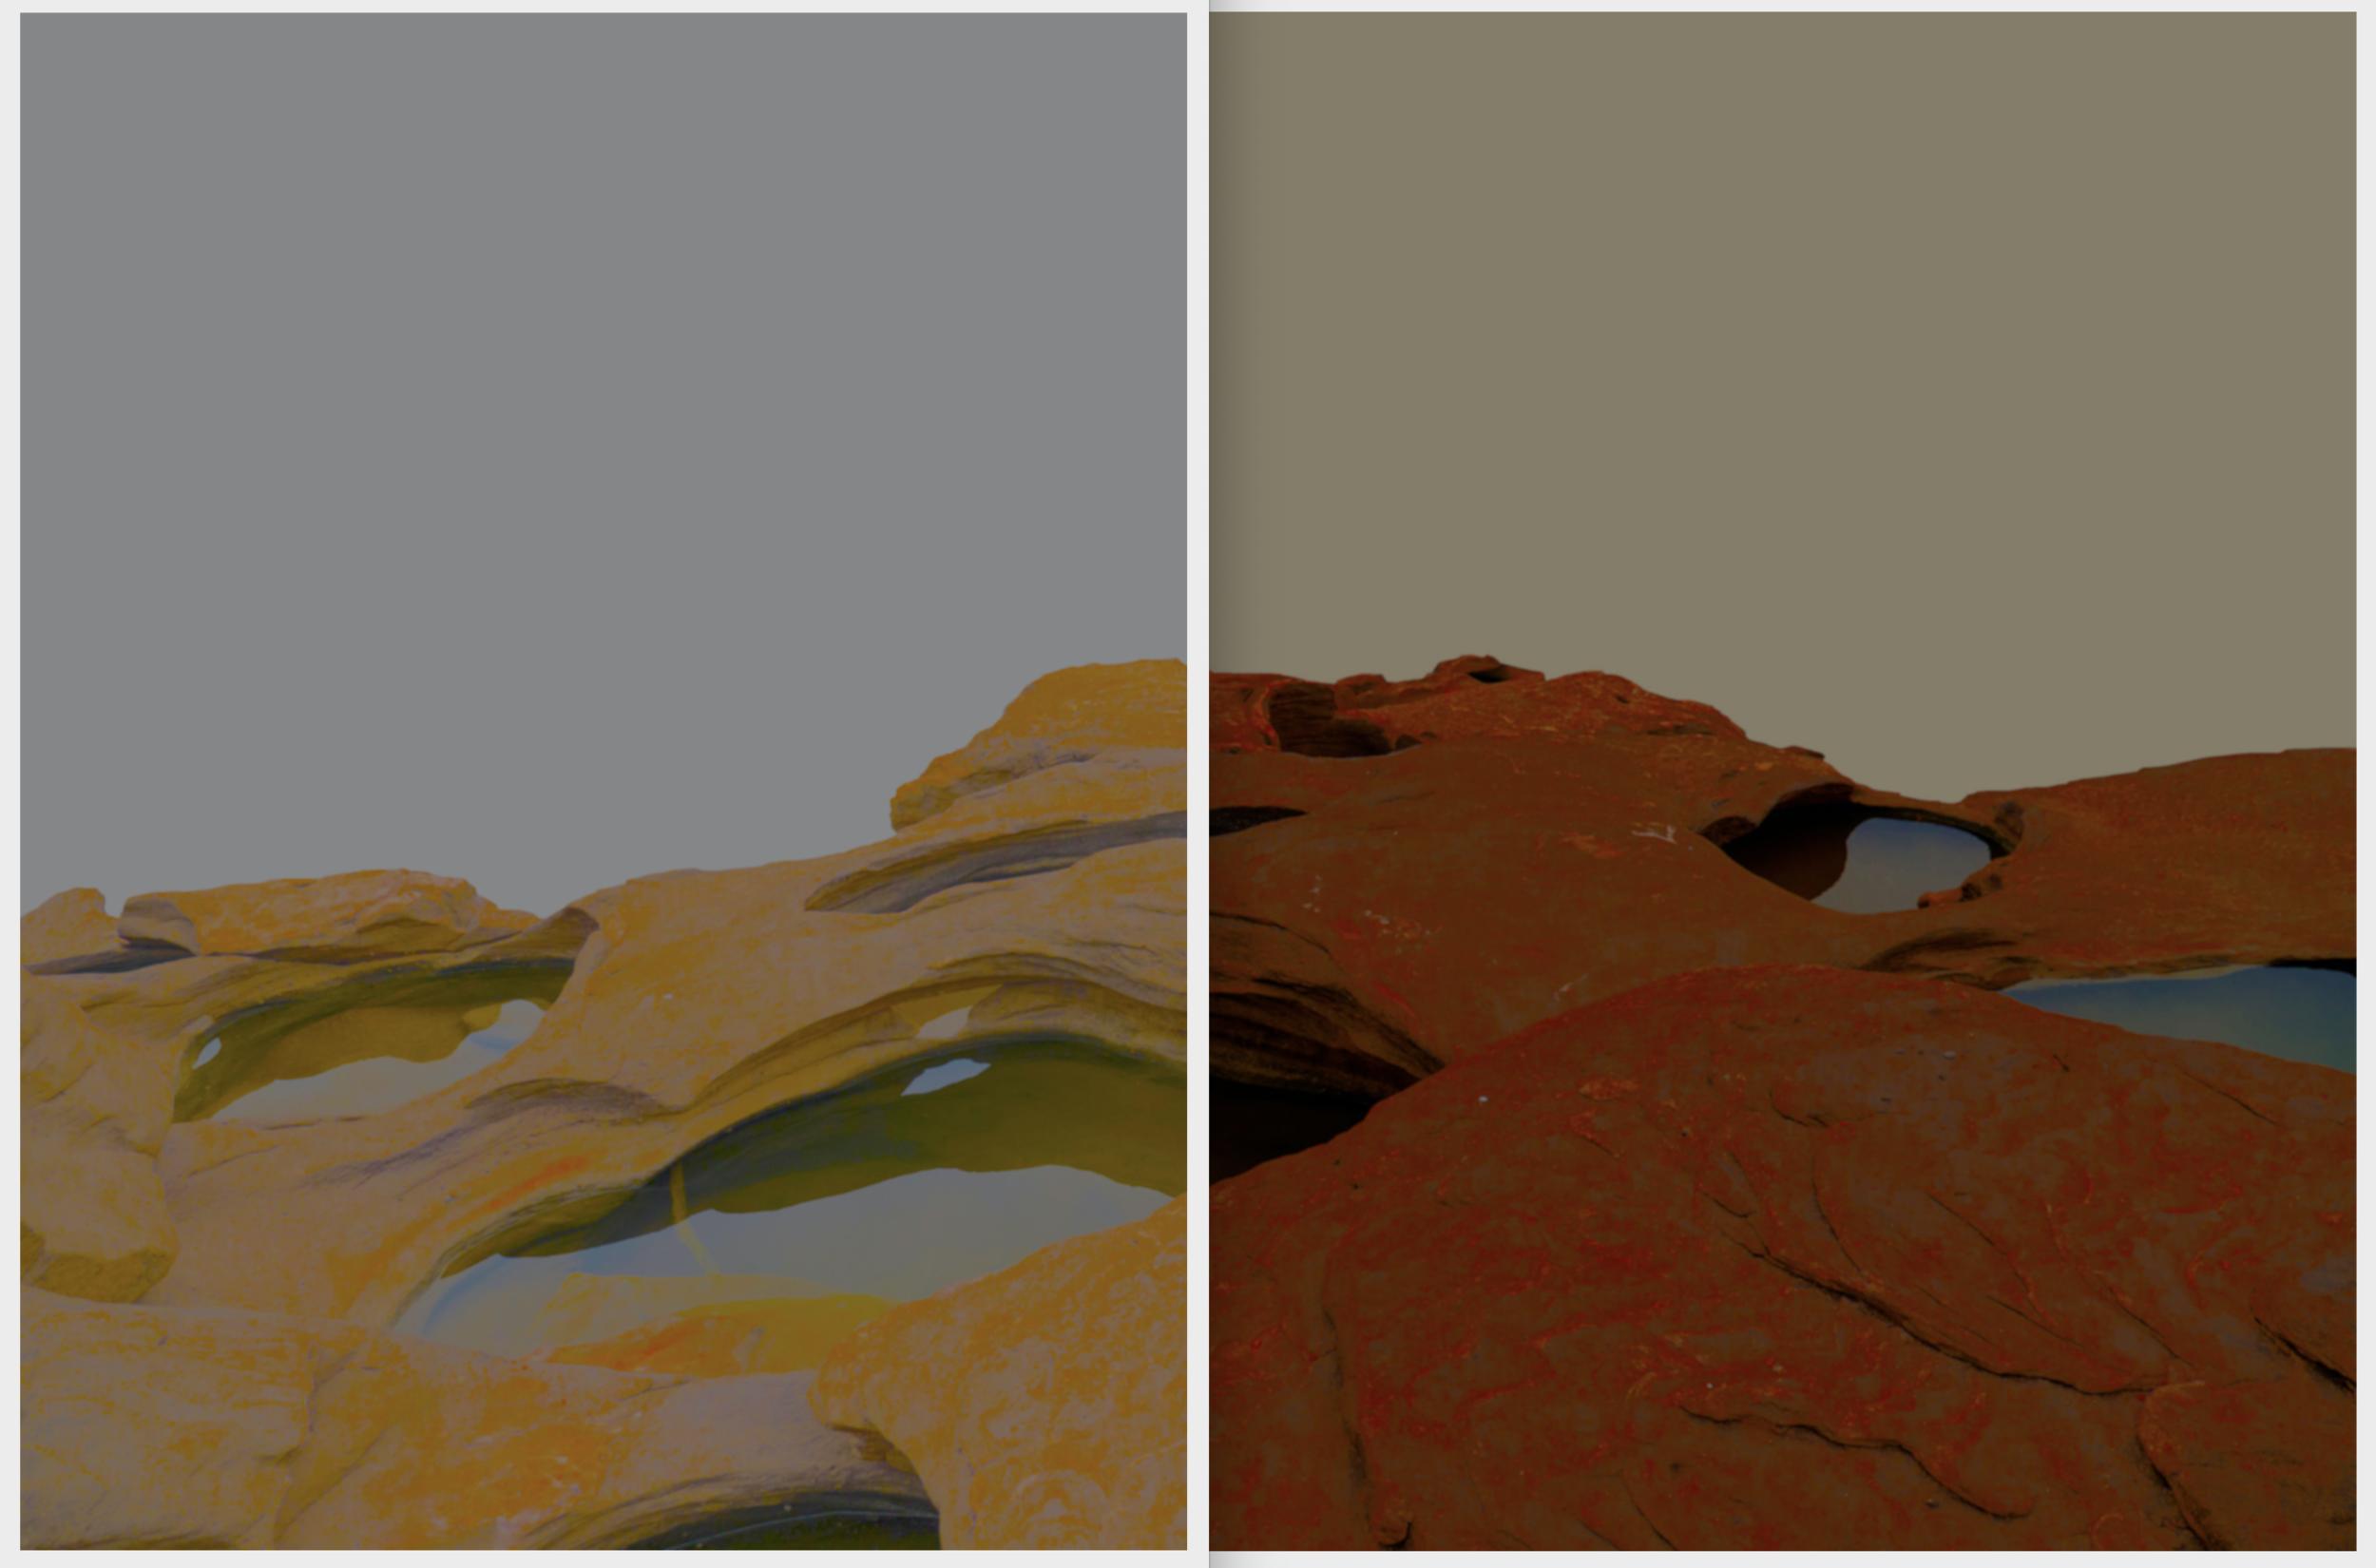 Beyond the Oecumene / Part XXIX (Diptych),  2019 Wax pastels, UV-print on aluminium 300 x 170 cm (118 x 67 in)